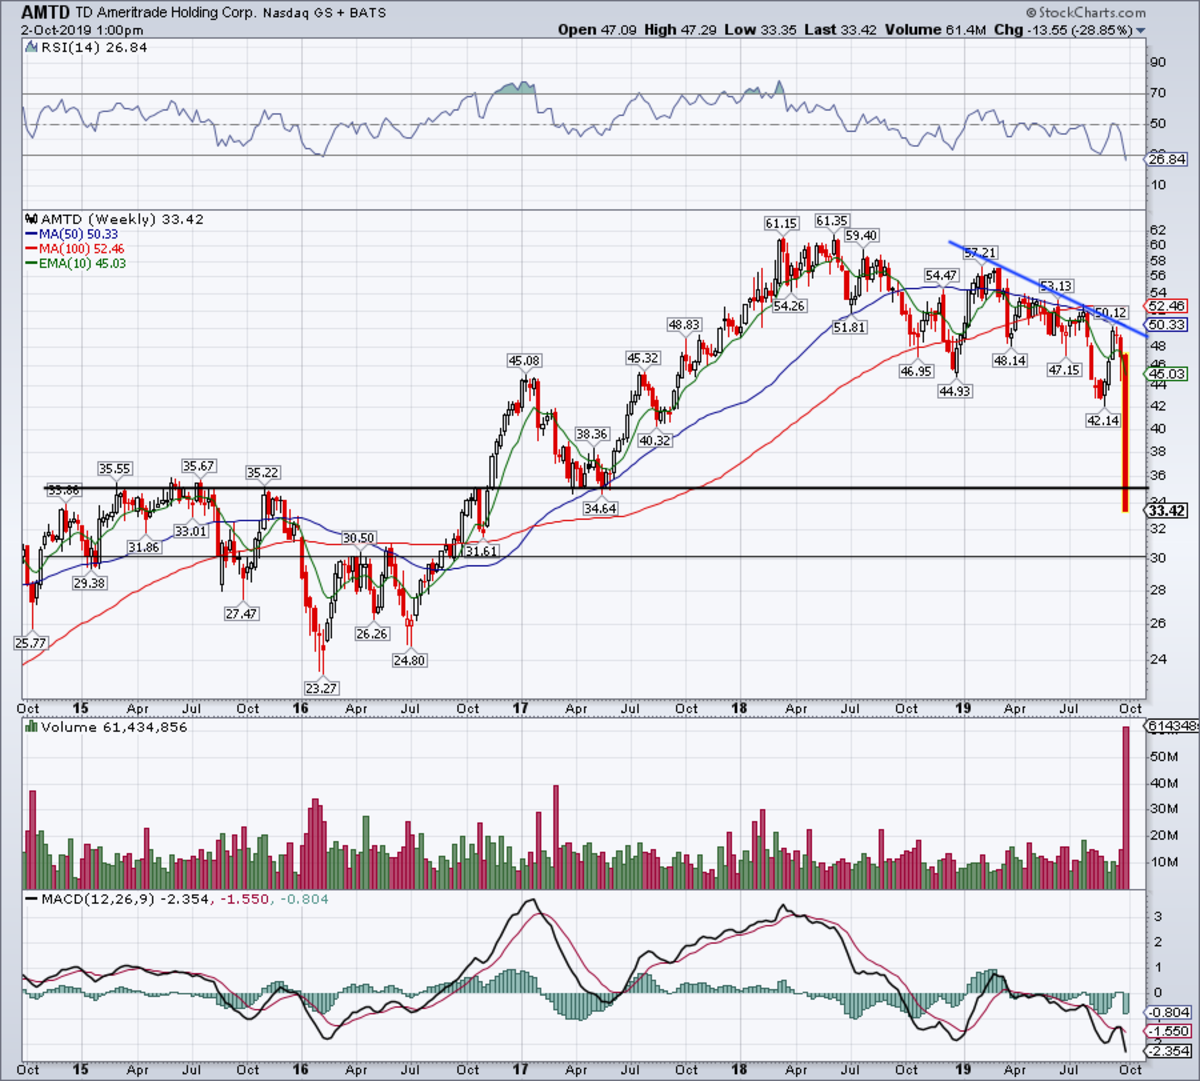 Weekly chart of TD Ameritrade stock.